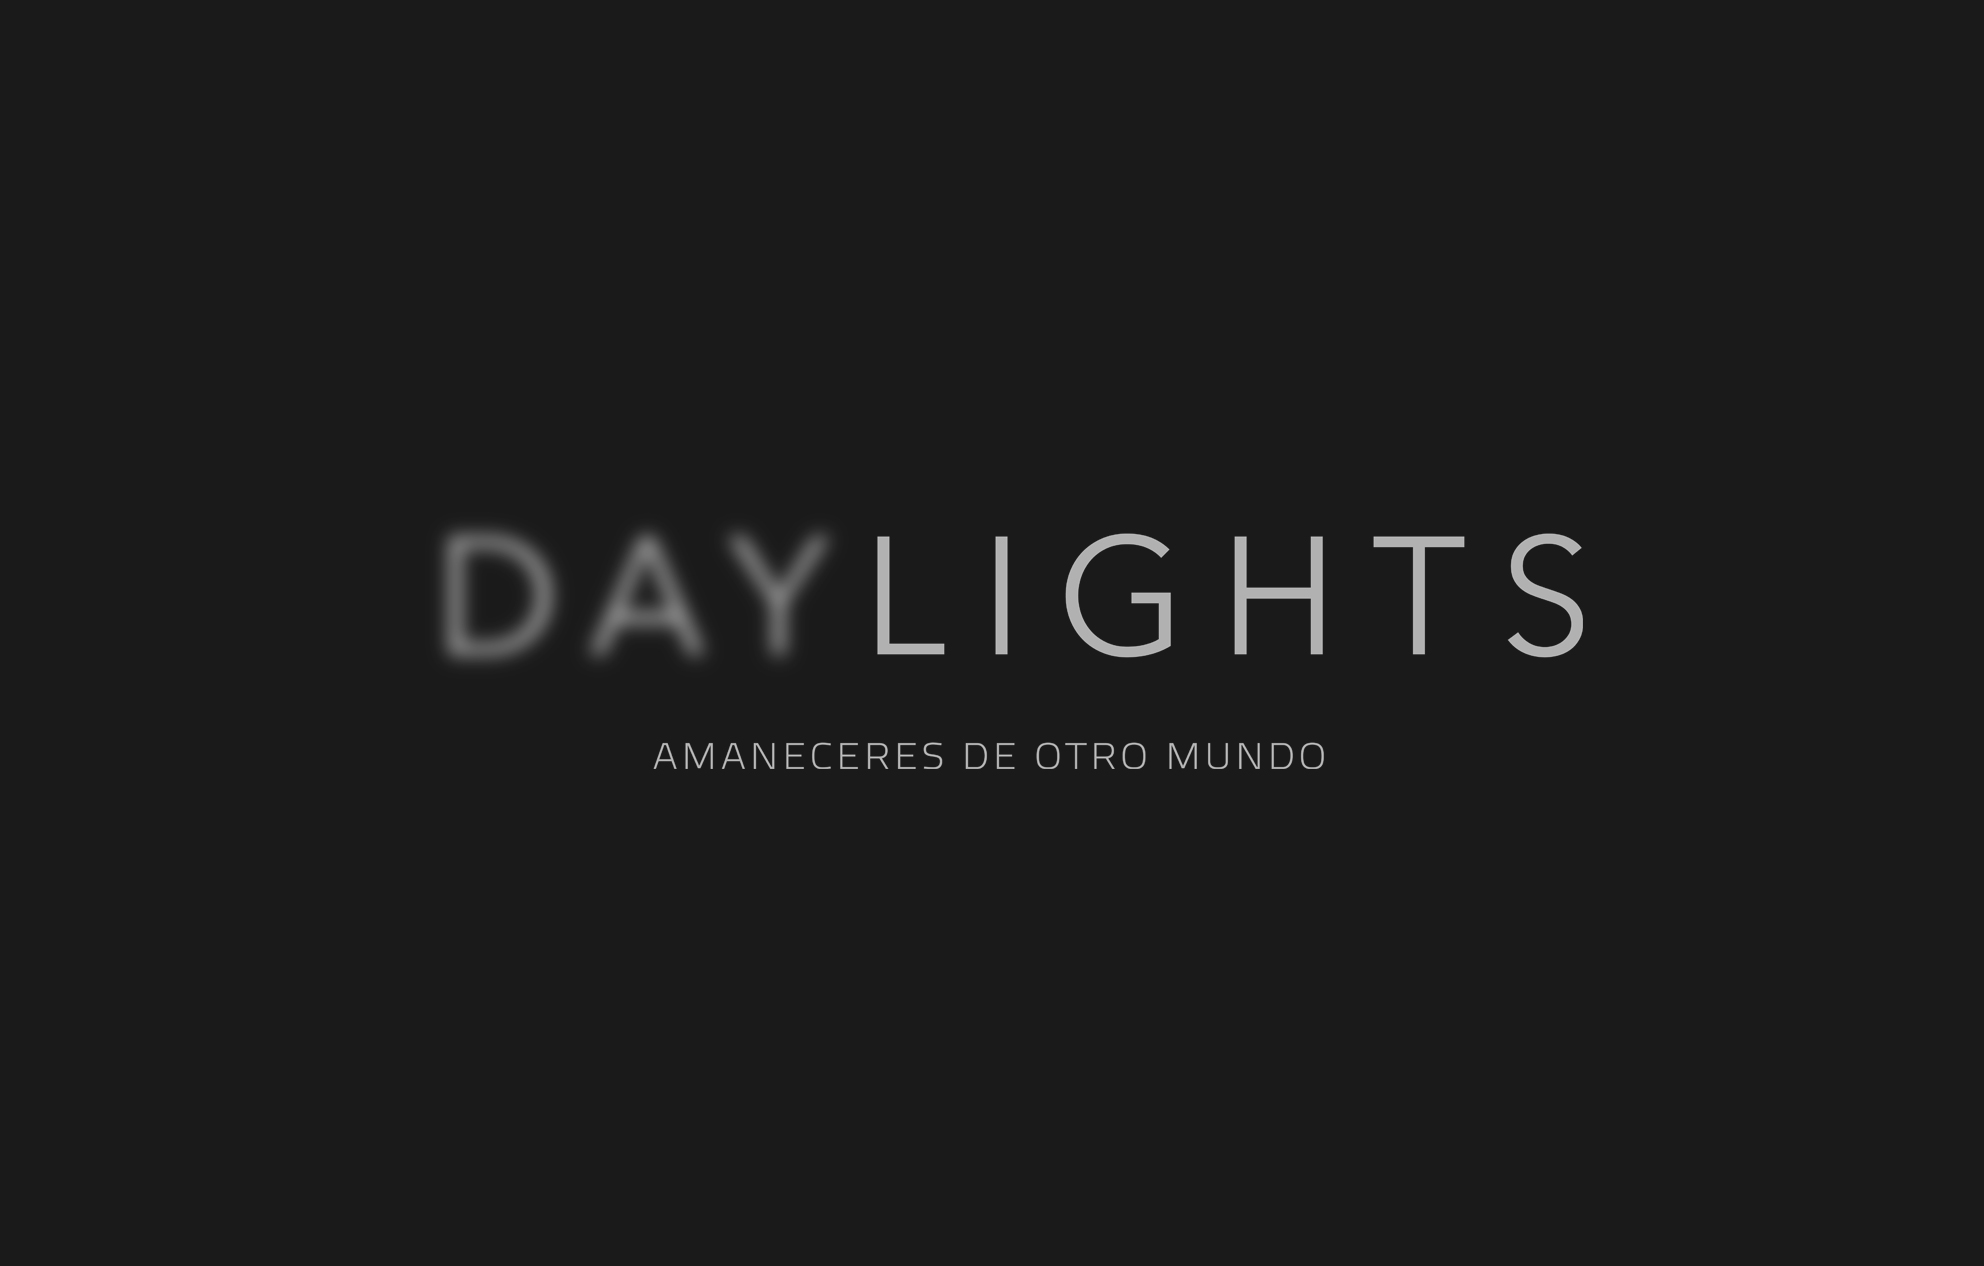 daylights_1